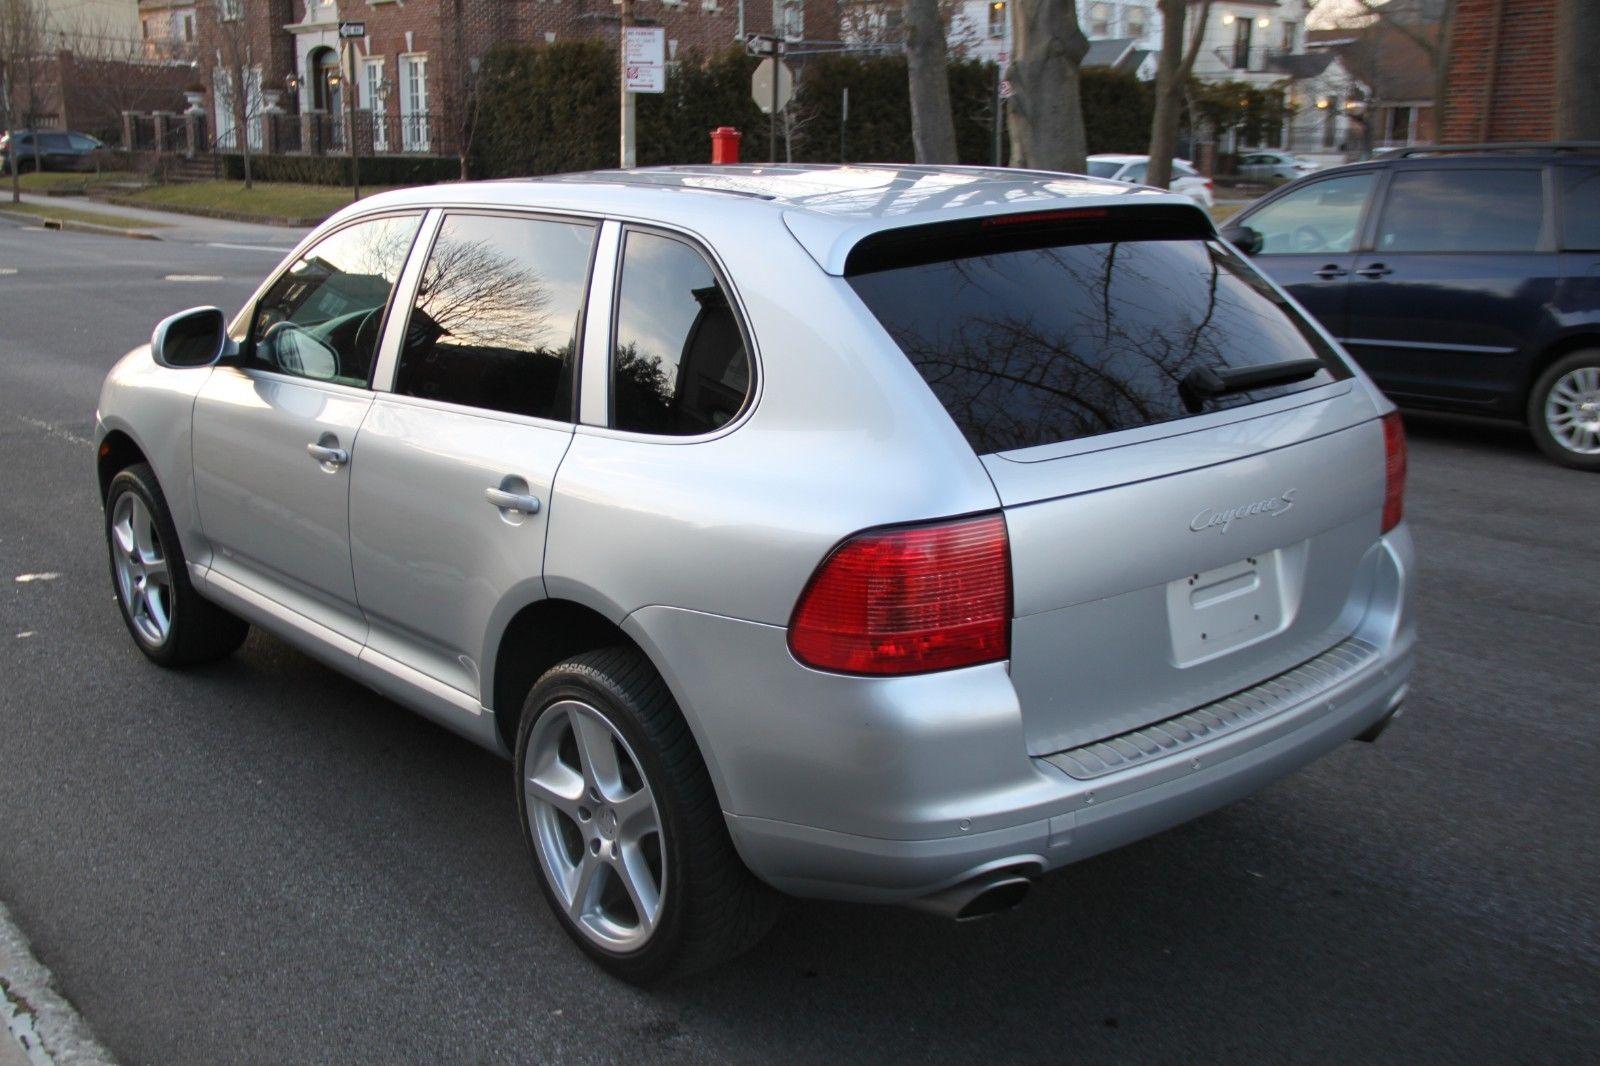 Autocheck Vs Carfax >> Amazing Cayenne S AWD 4dr SUV 2004 Porsche Cayenne S AWD ...